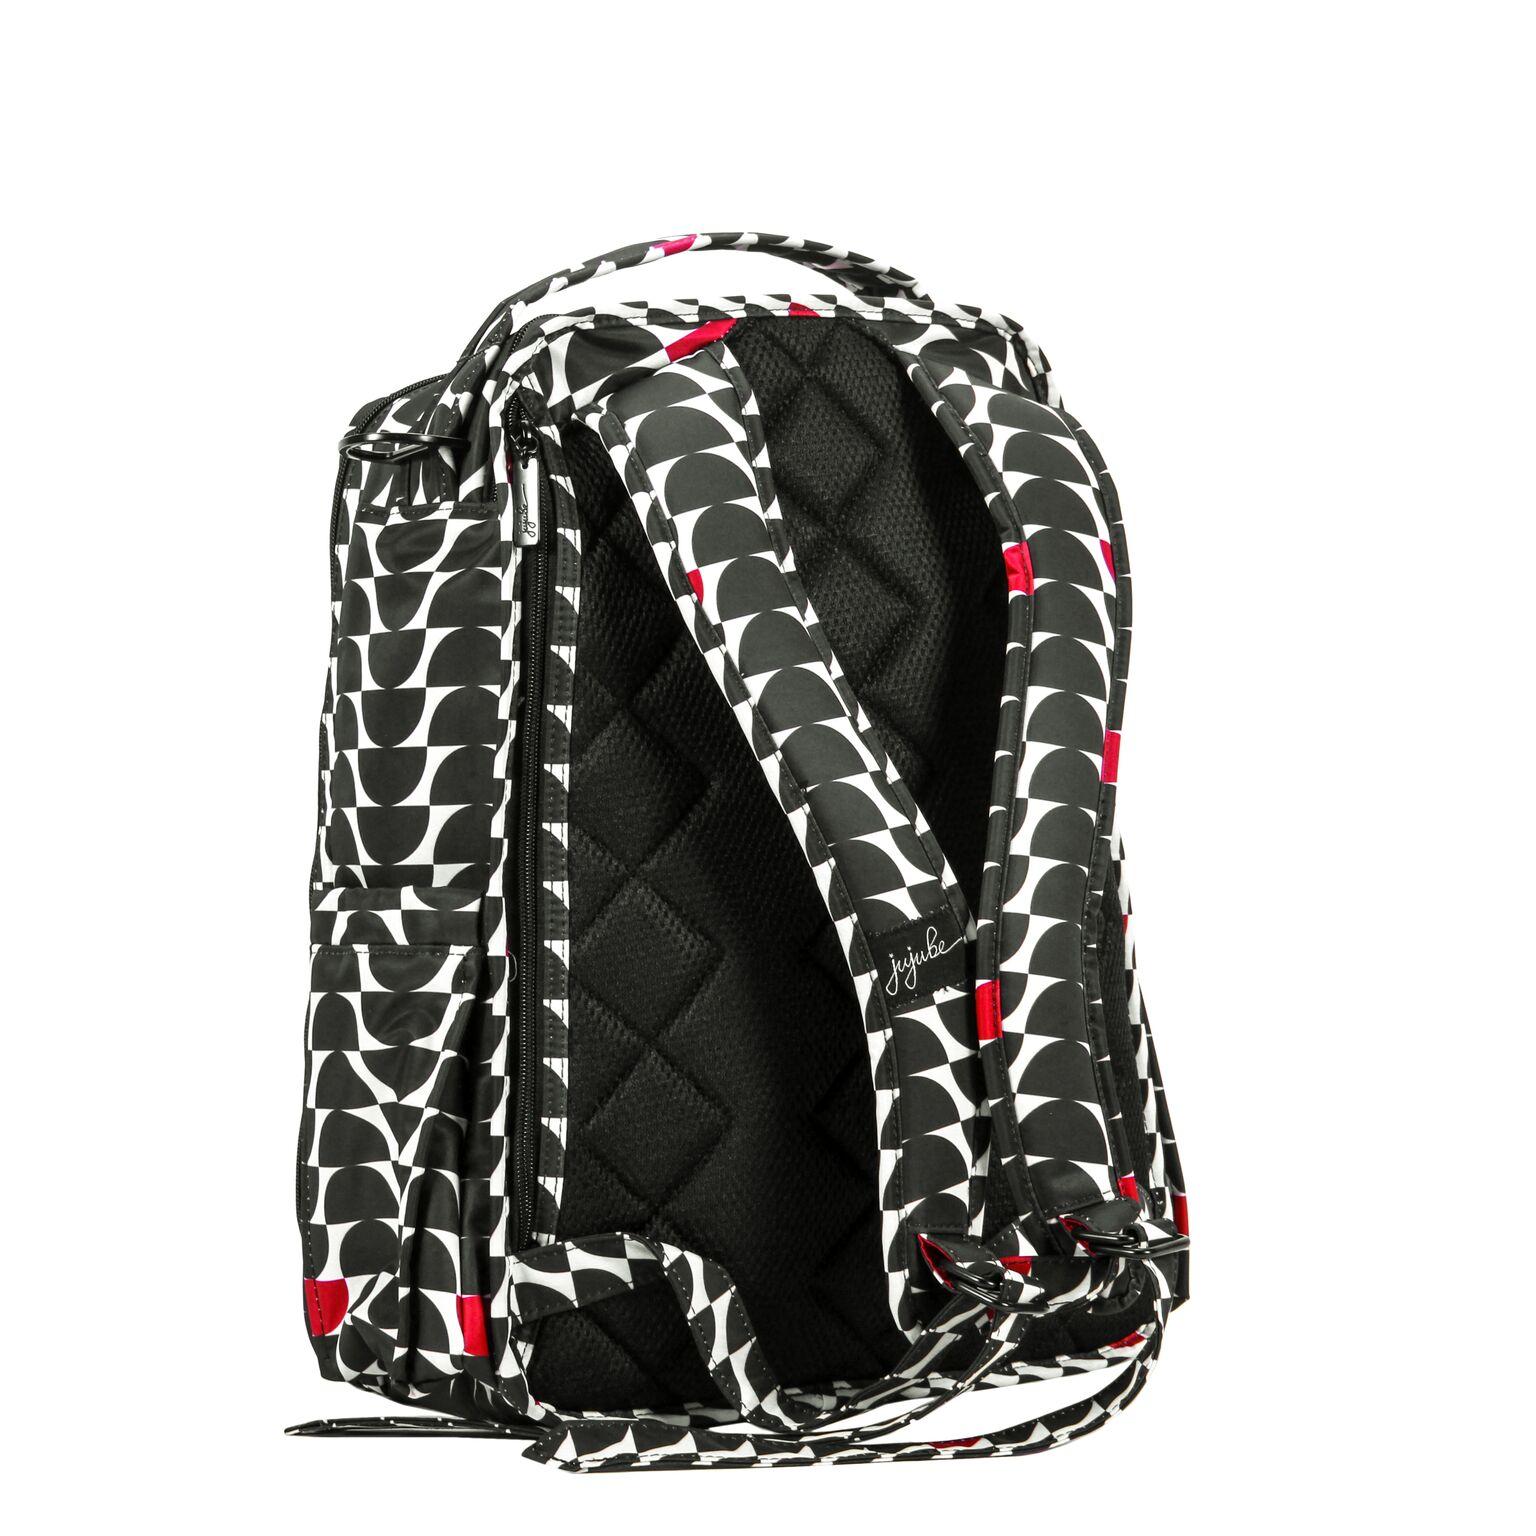 Рюкзак для мамы Ju-Ju-Be - Be Right Back, Onyx Black Widow